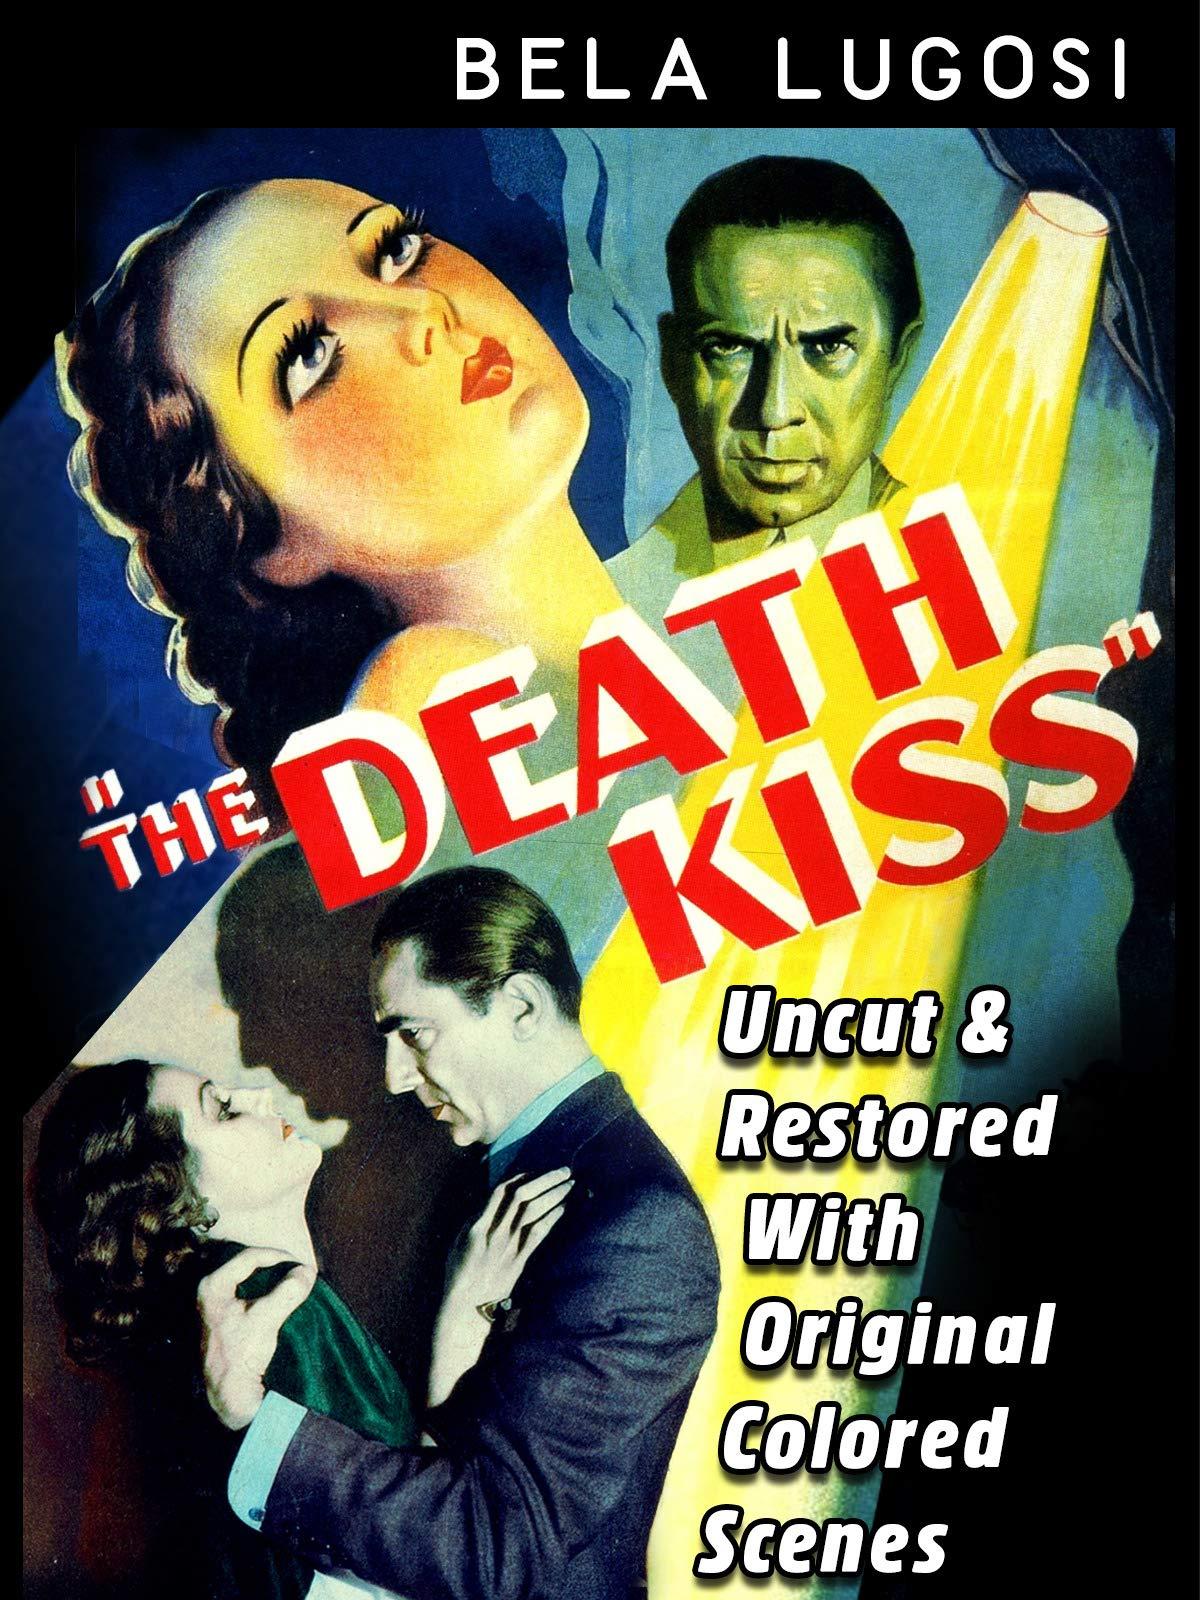 The Death Kiss - Bela Lugosi, Uncut & Restored With Original Colored Scenes